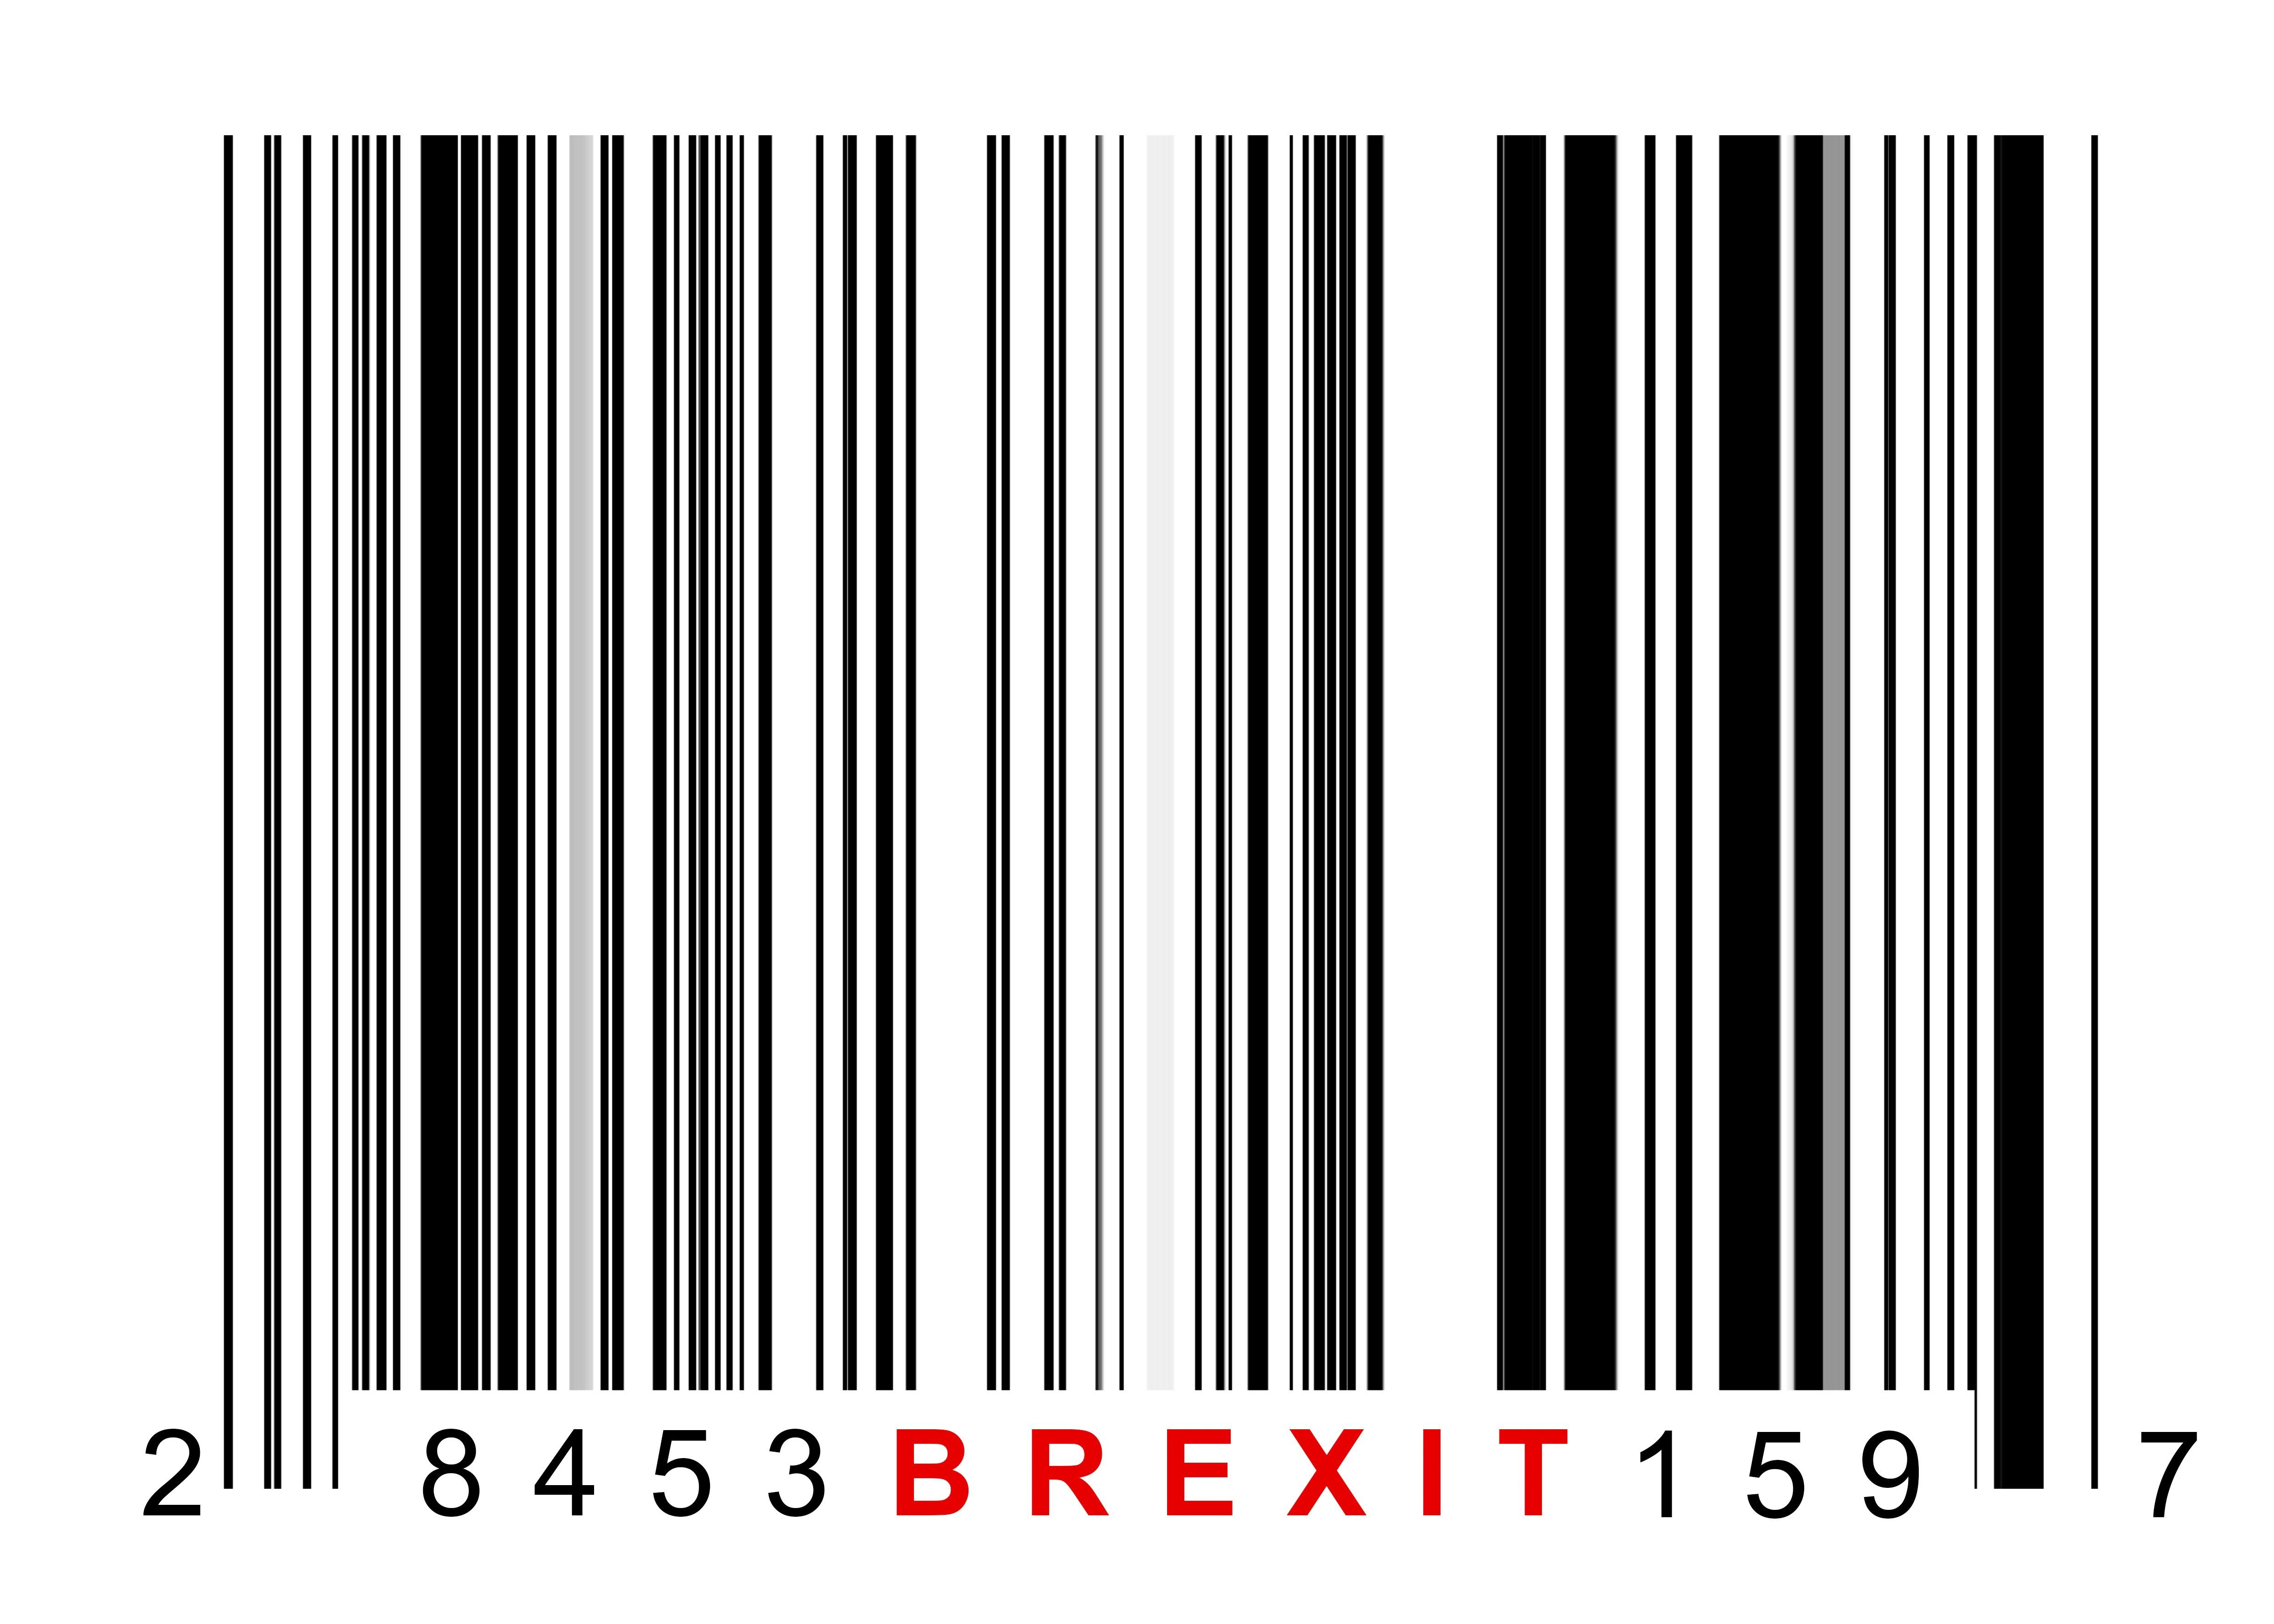 Brexit fears still continue to dominate Britain's digital focus